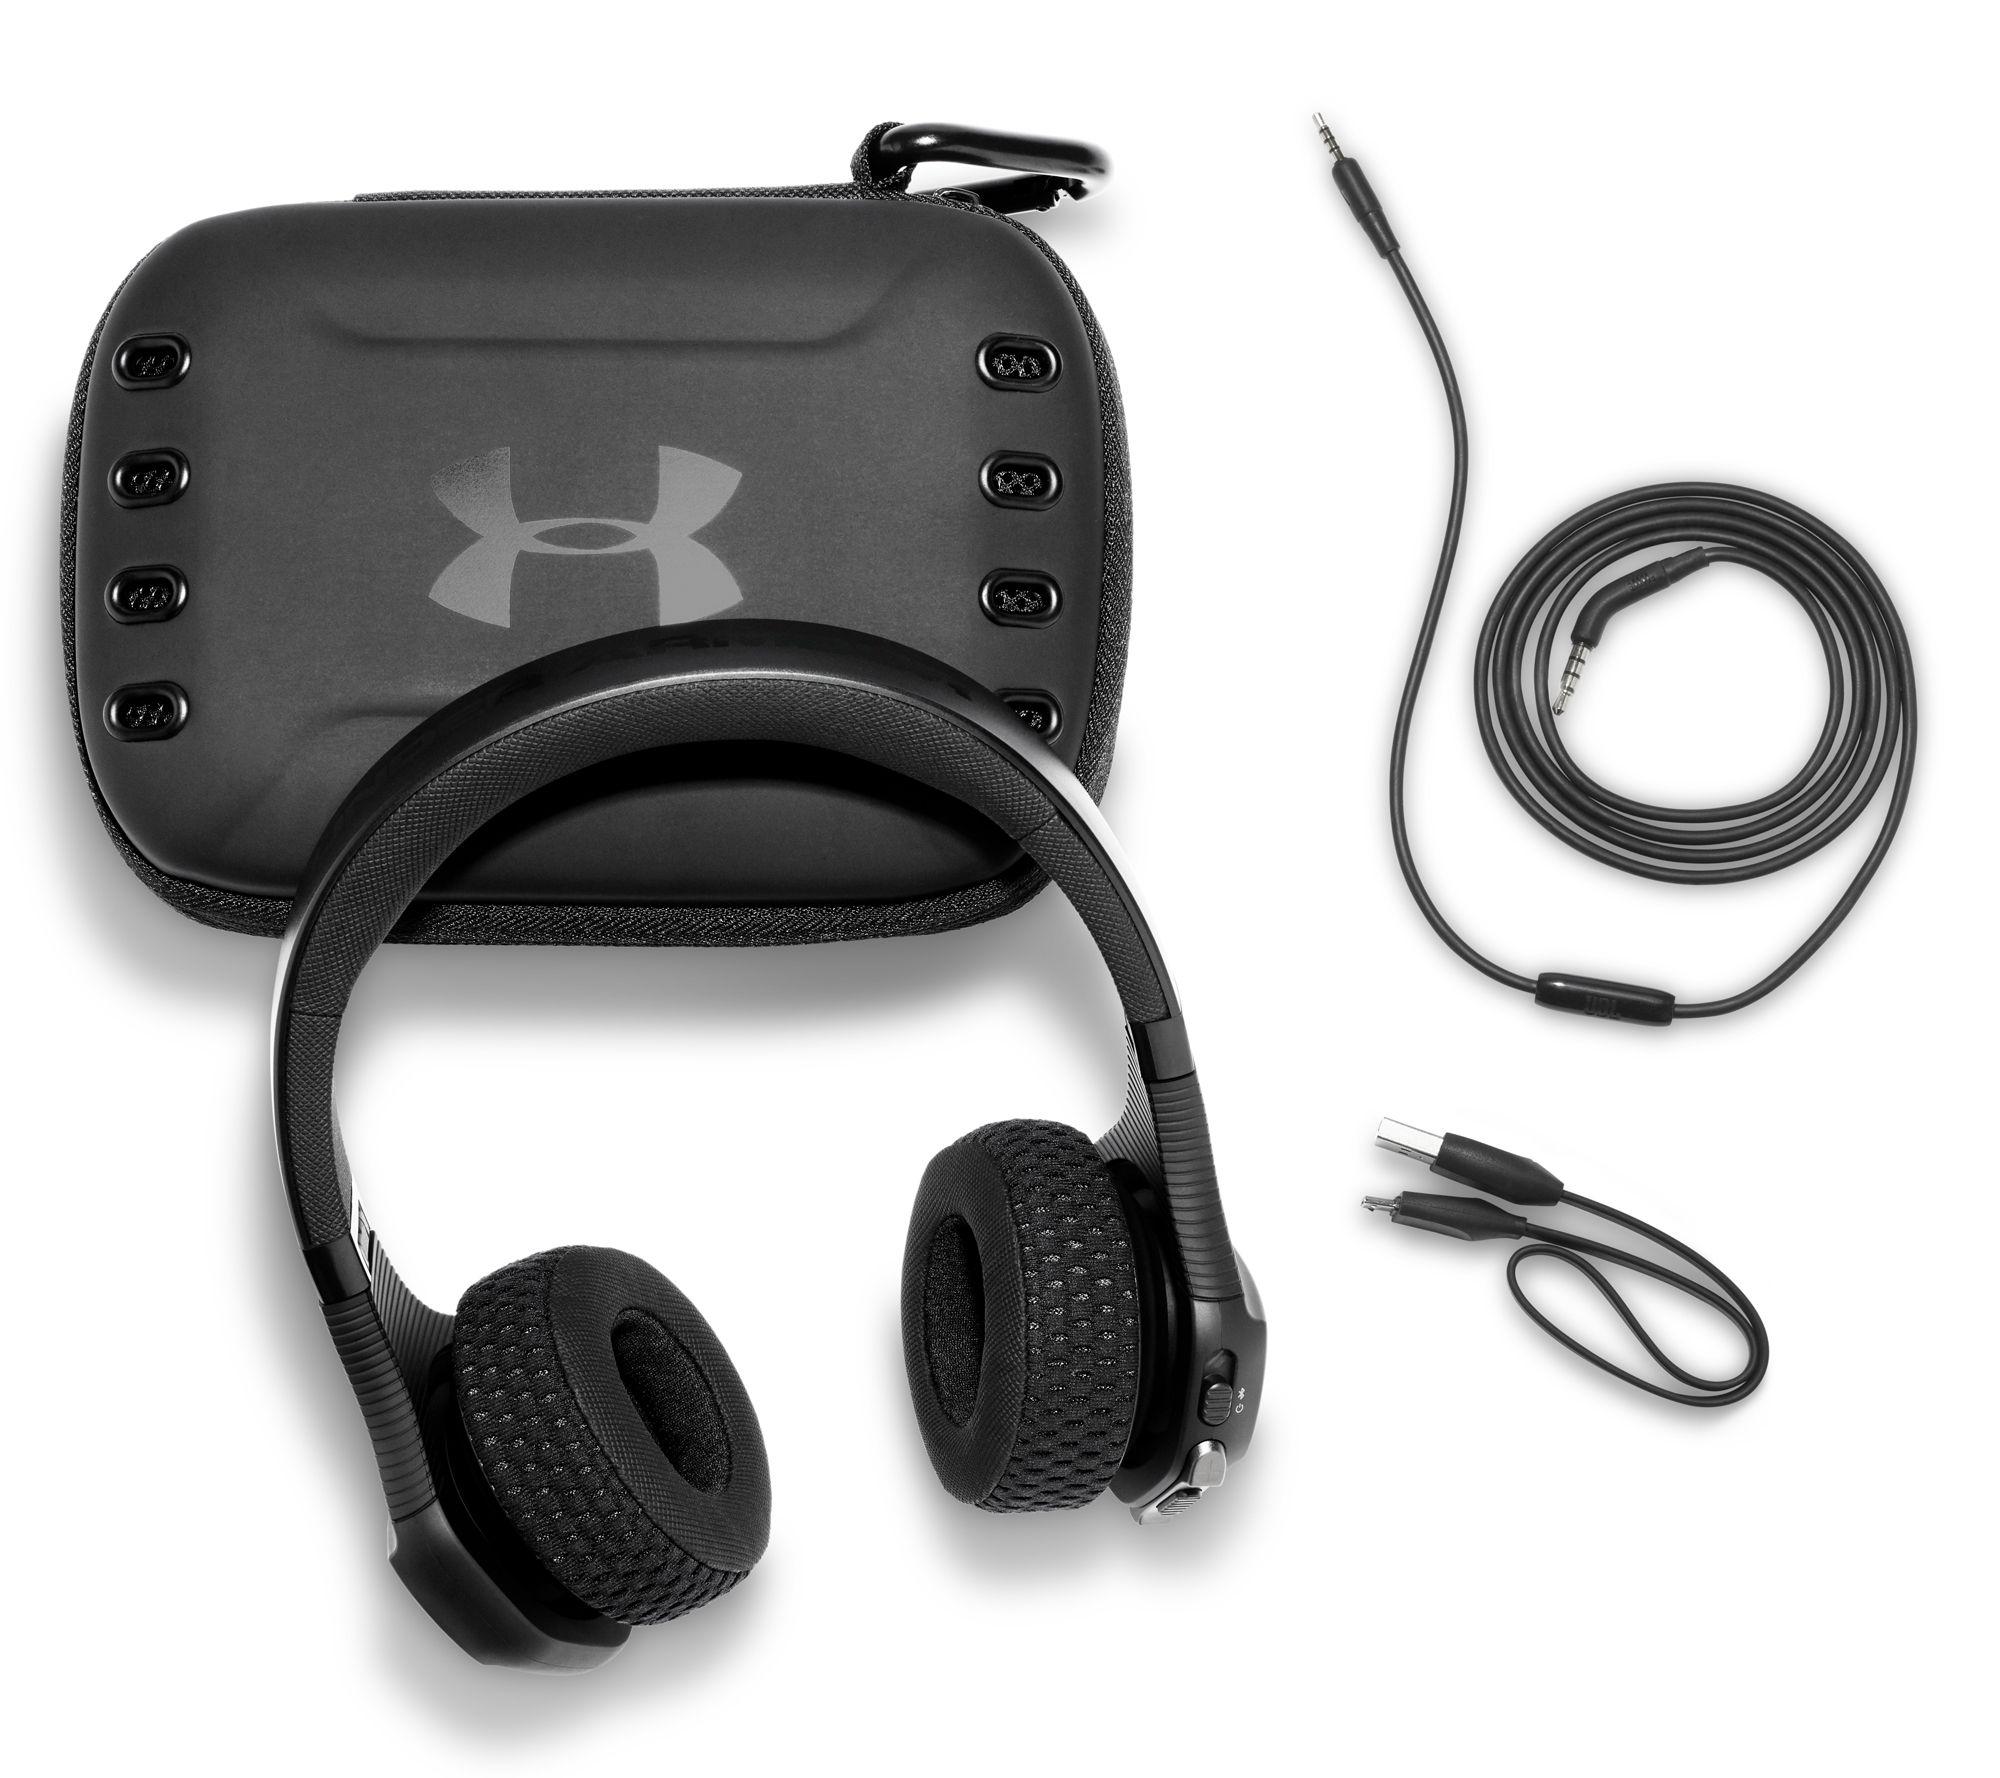 d0bb4663d62 JBL Under Armour Sport Wireless Train Headphones - Page 1 — QVC.com